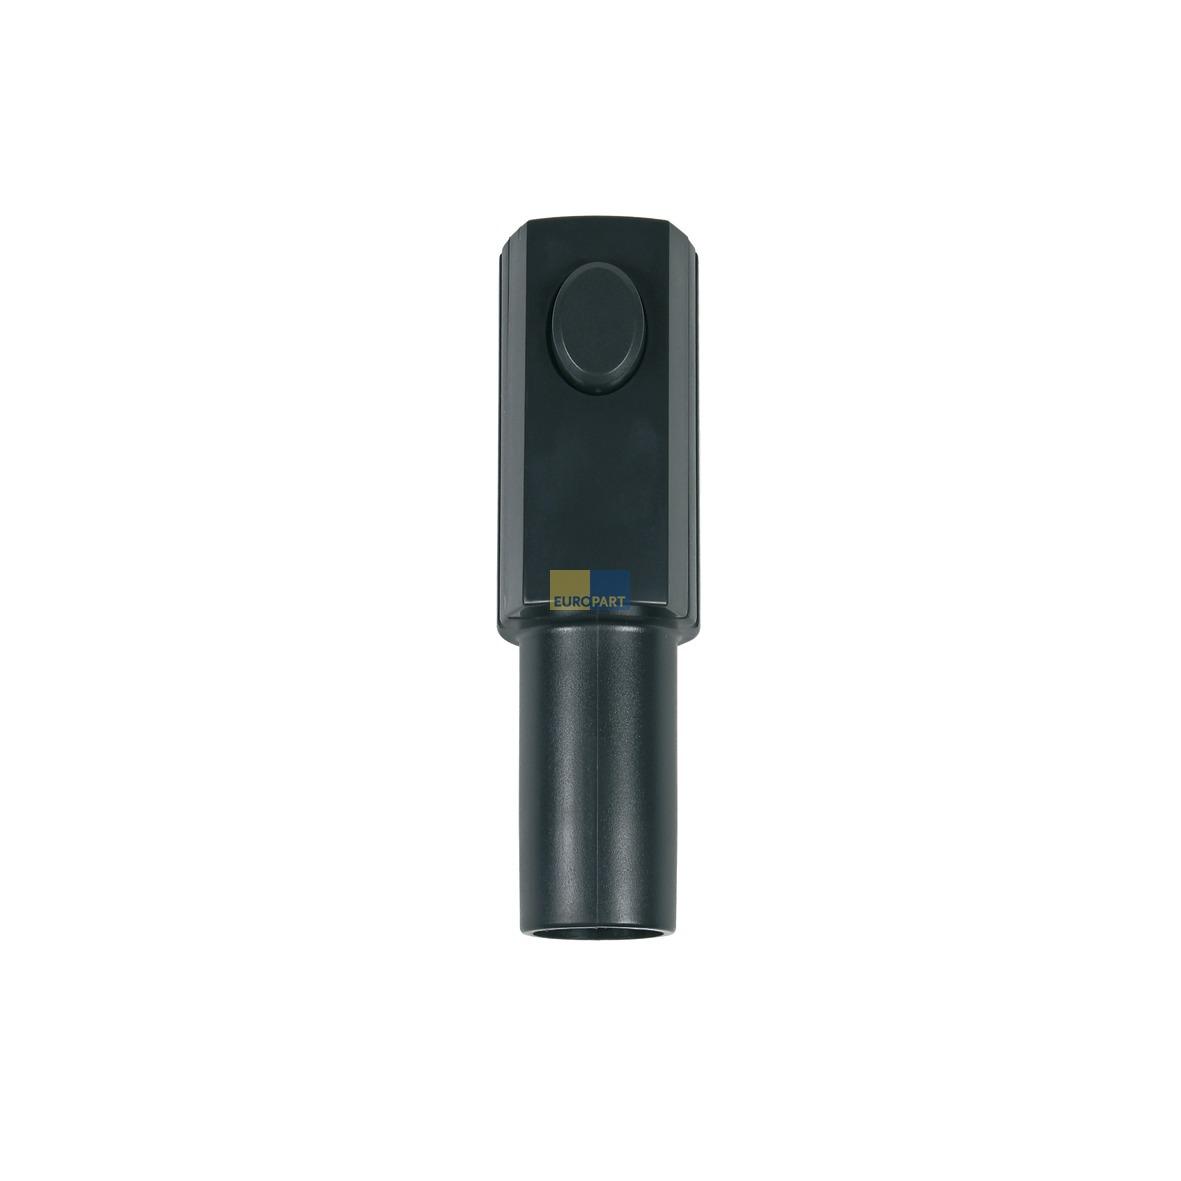 Staubsaugerrohr-Adapter 36mm oval / 32mm Ø, AEG - ABEA Hausgeräte ...